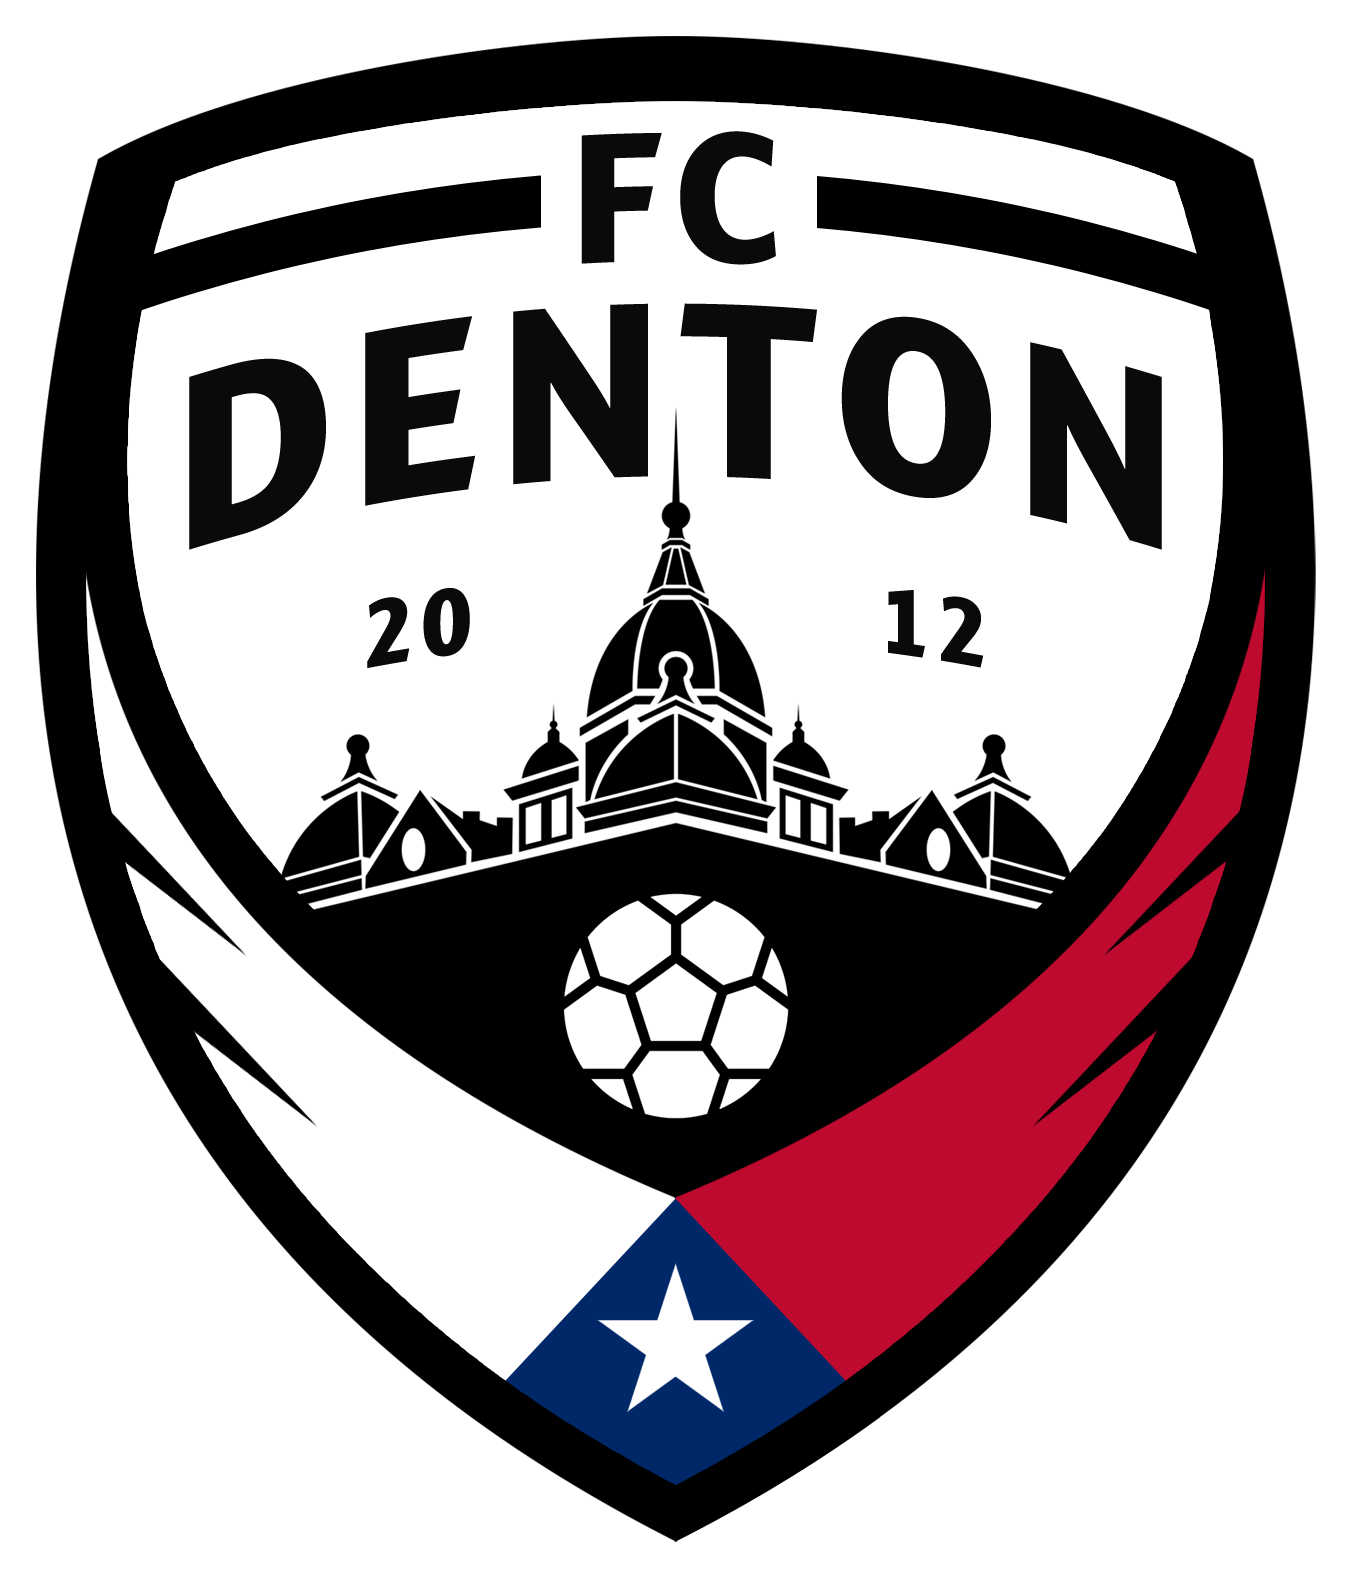 FC Denton